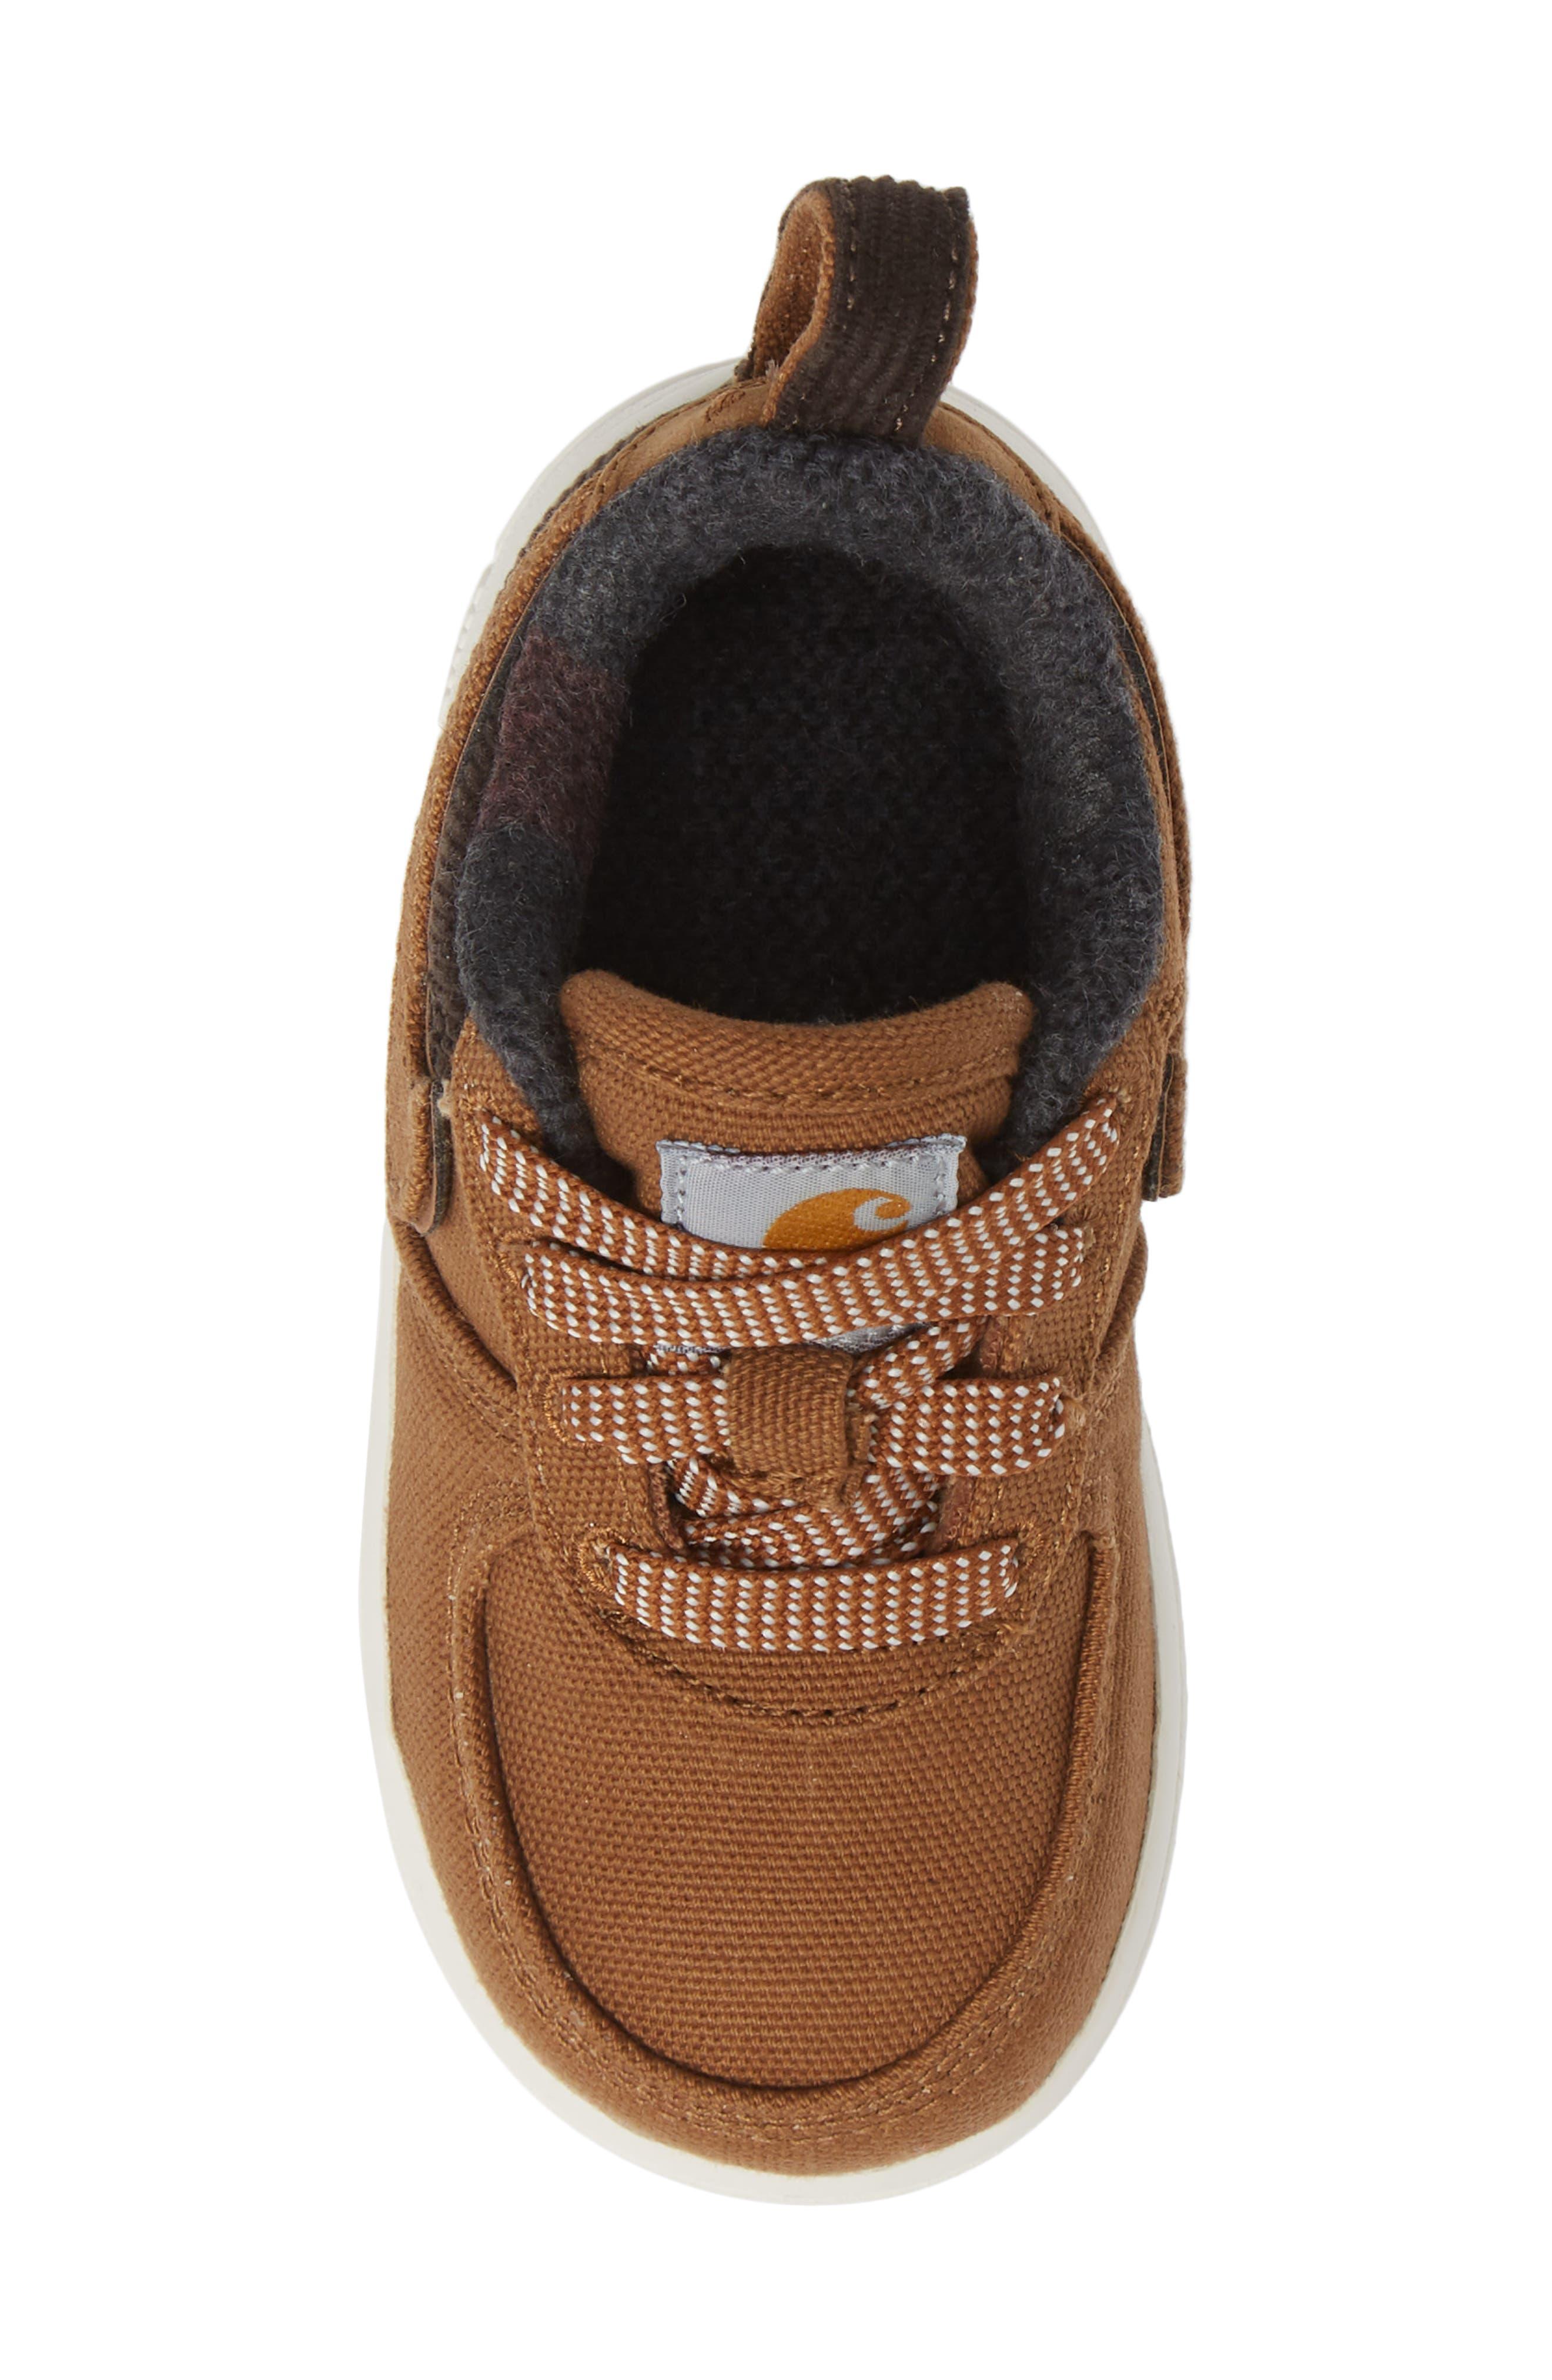 x Carhartt Air Force 1 Premium Sneaker,                             Alternate thumbnail 5, color,                             ALE BROWN/ ALE BROWN-SAIL